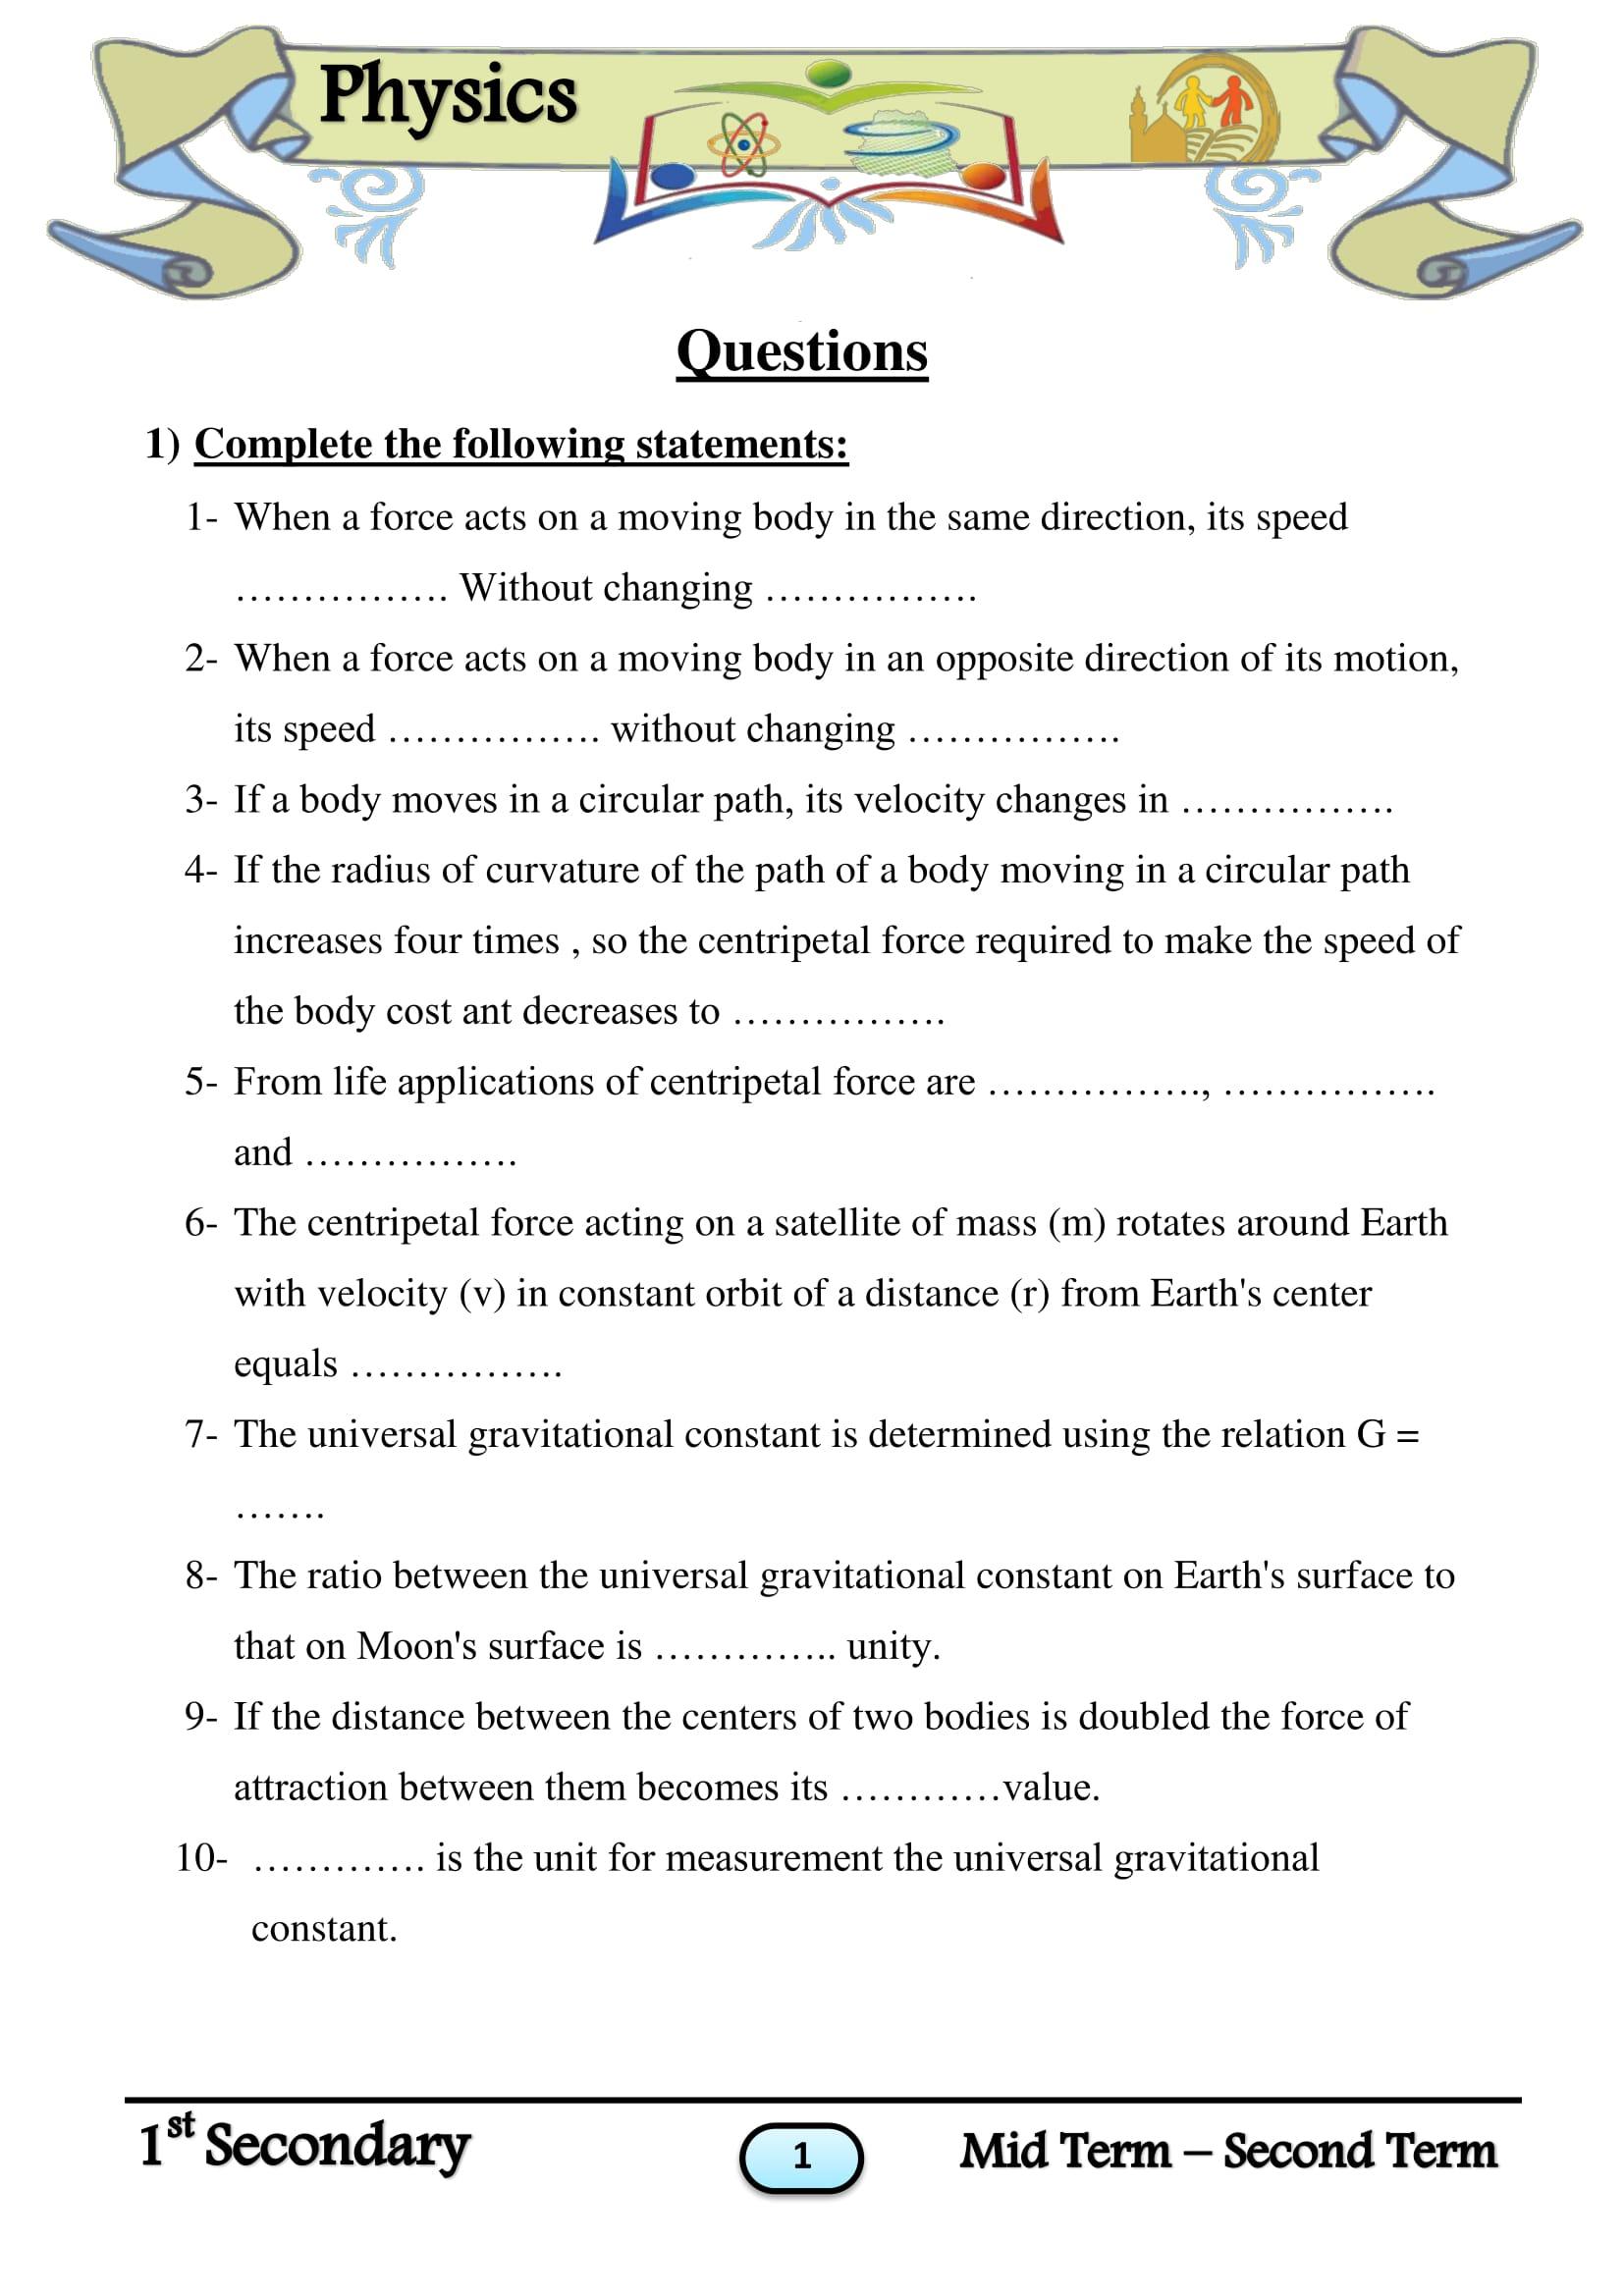 exam-eg.com_1511531306741.jpg